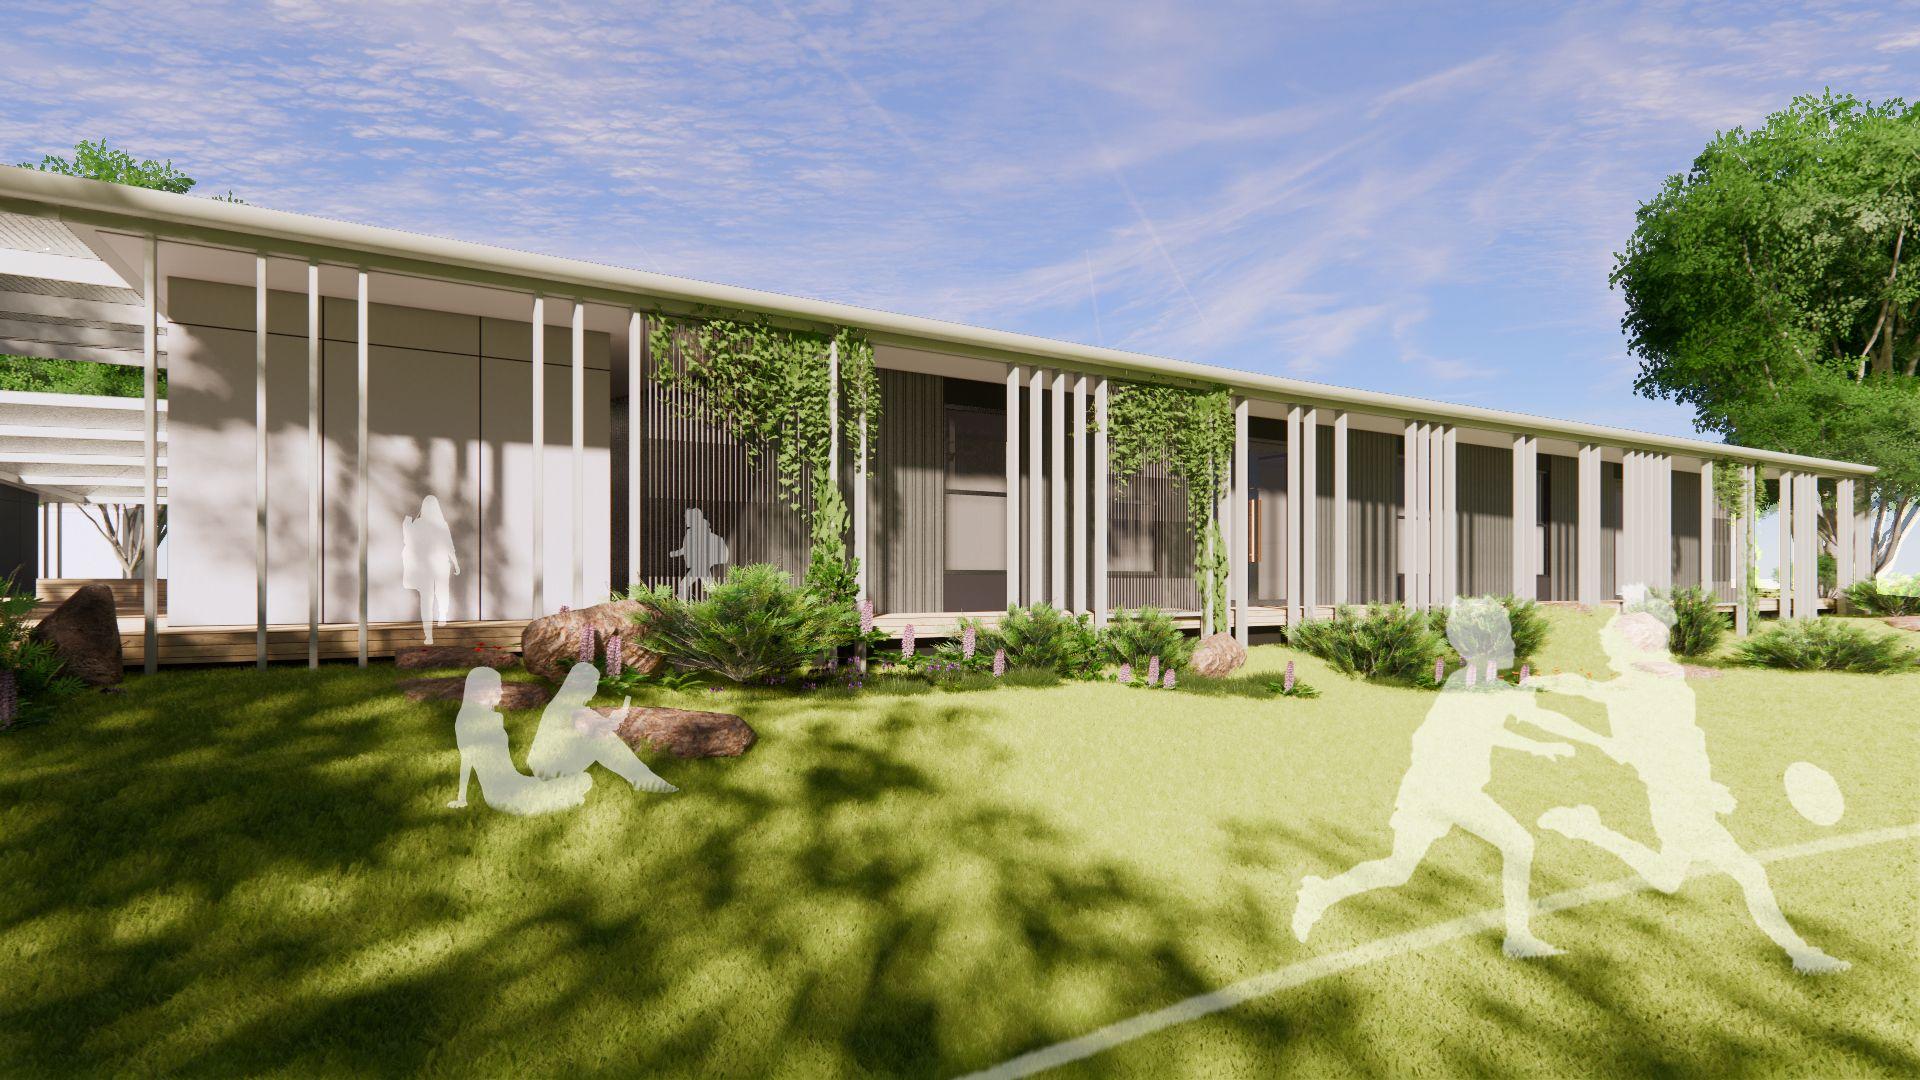 $4 million upgrade for Moonta Area School